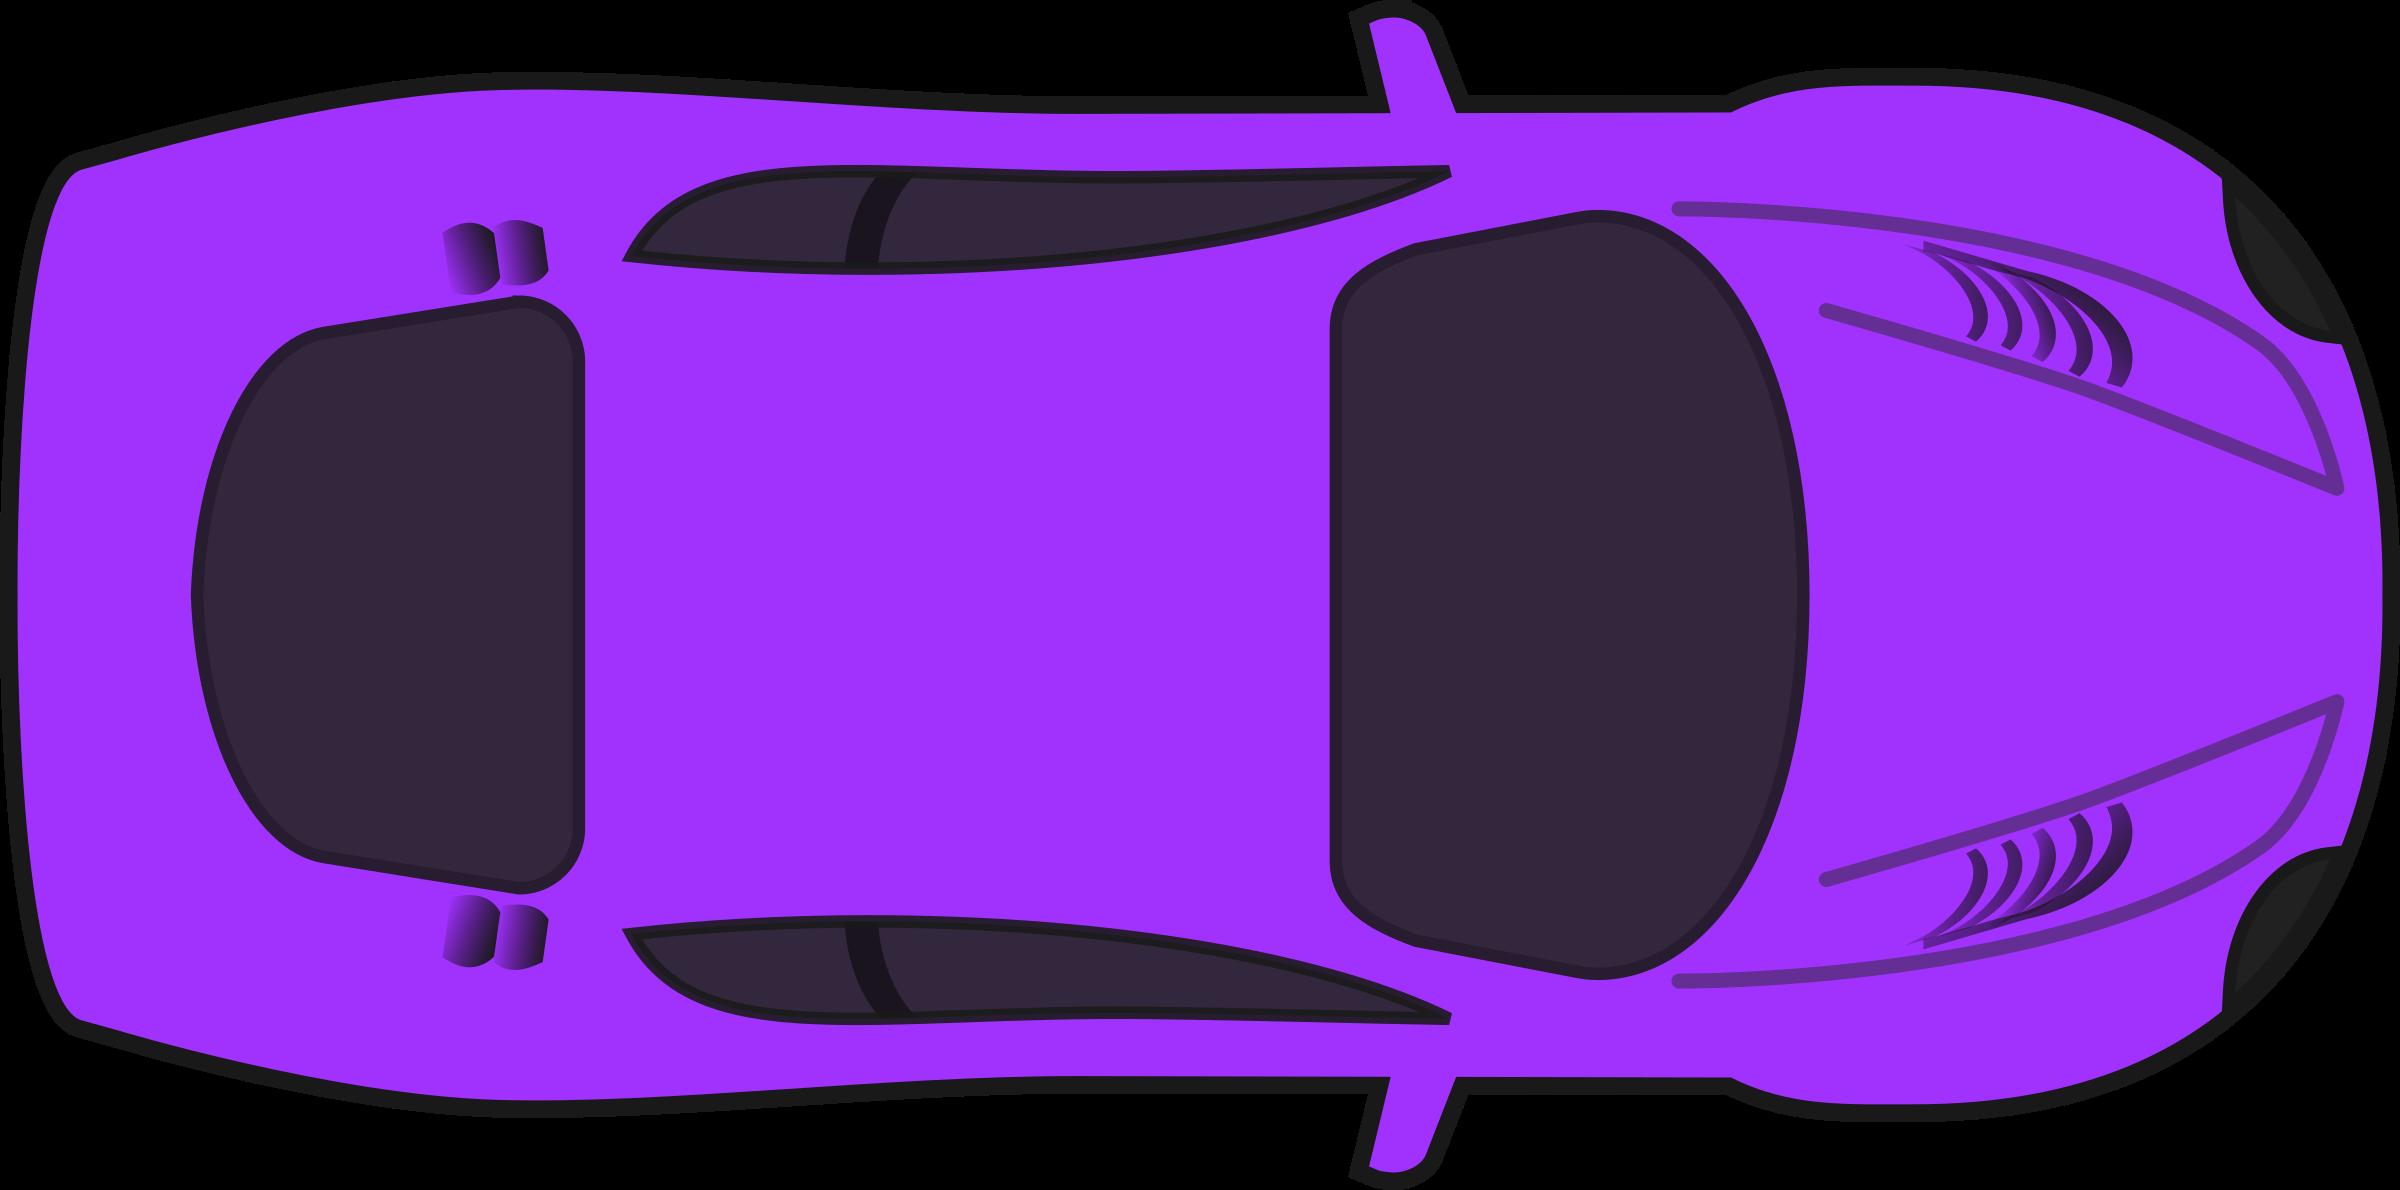 Race car top down clipart 4 » Clipart Station.